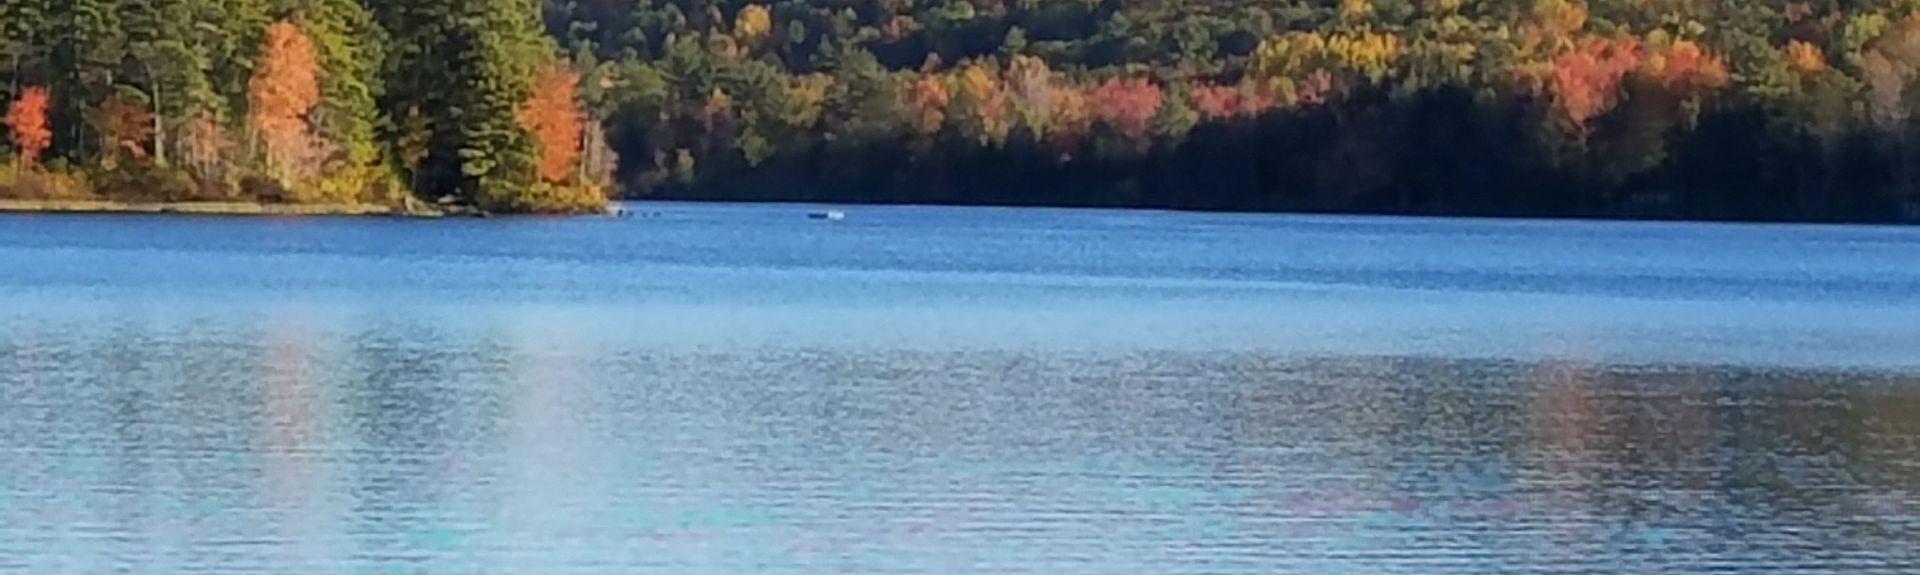 Limington, Maine, Stany Zjednoczone